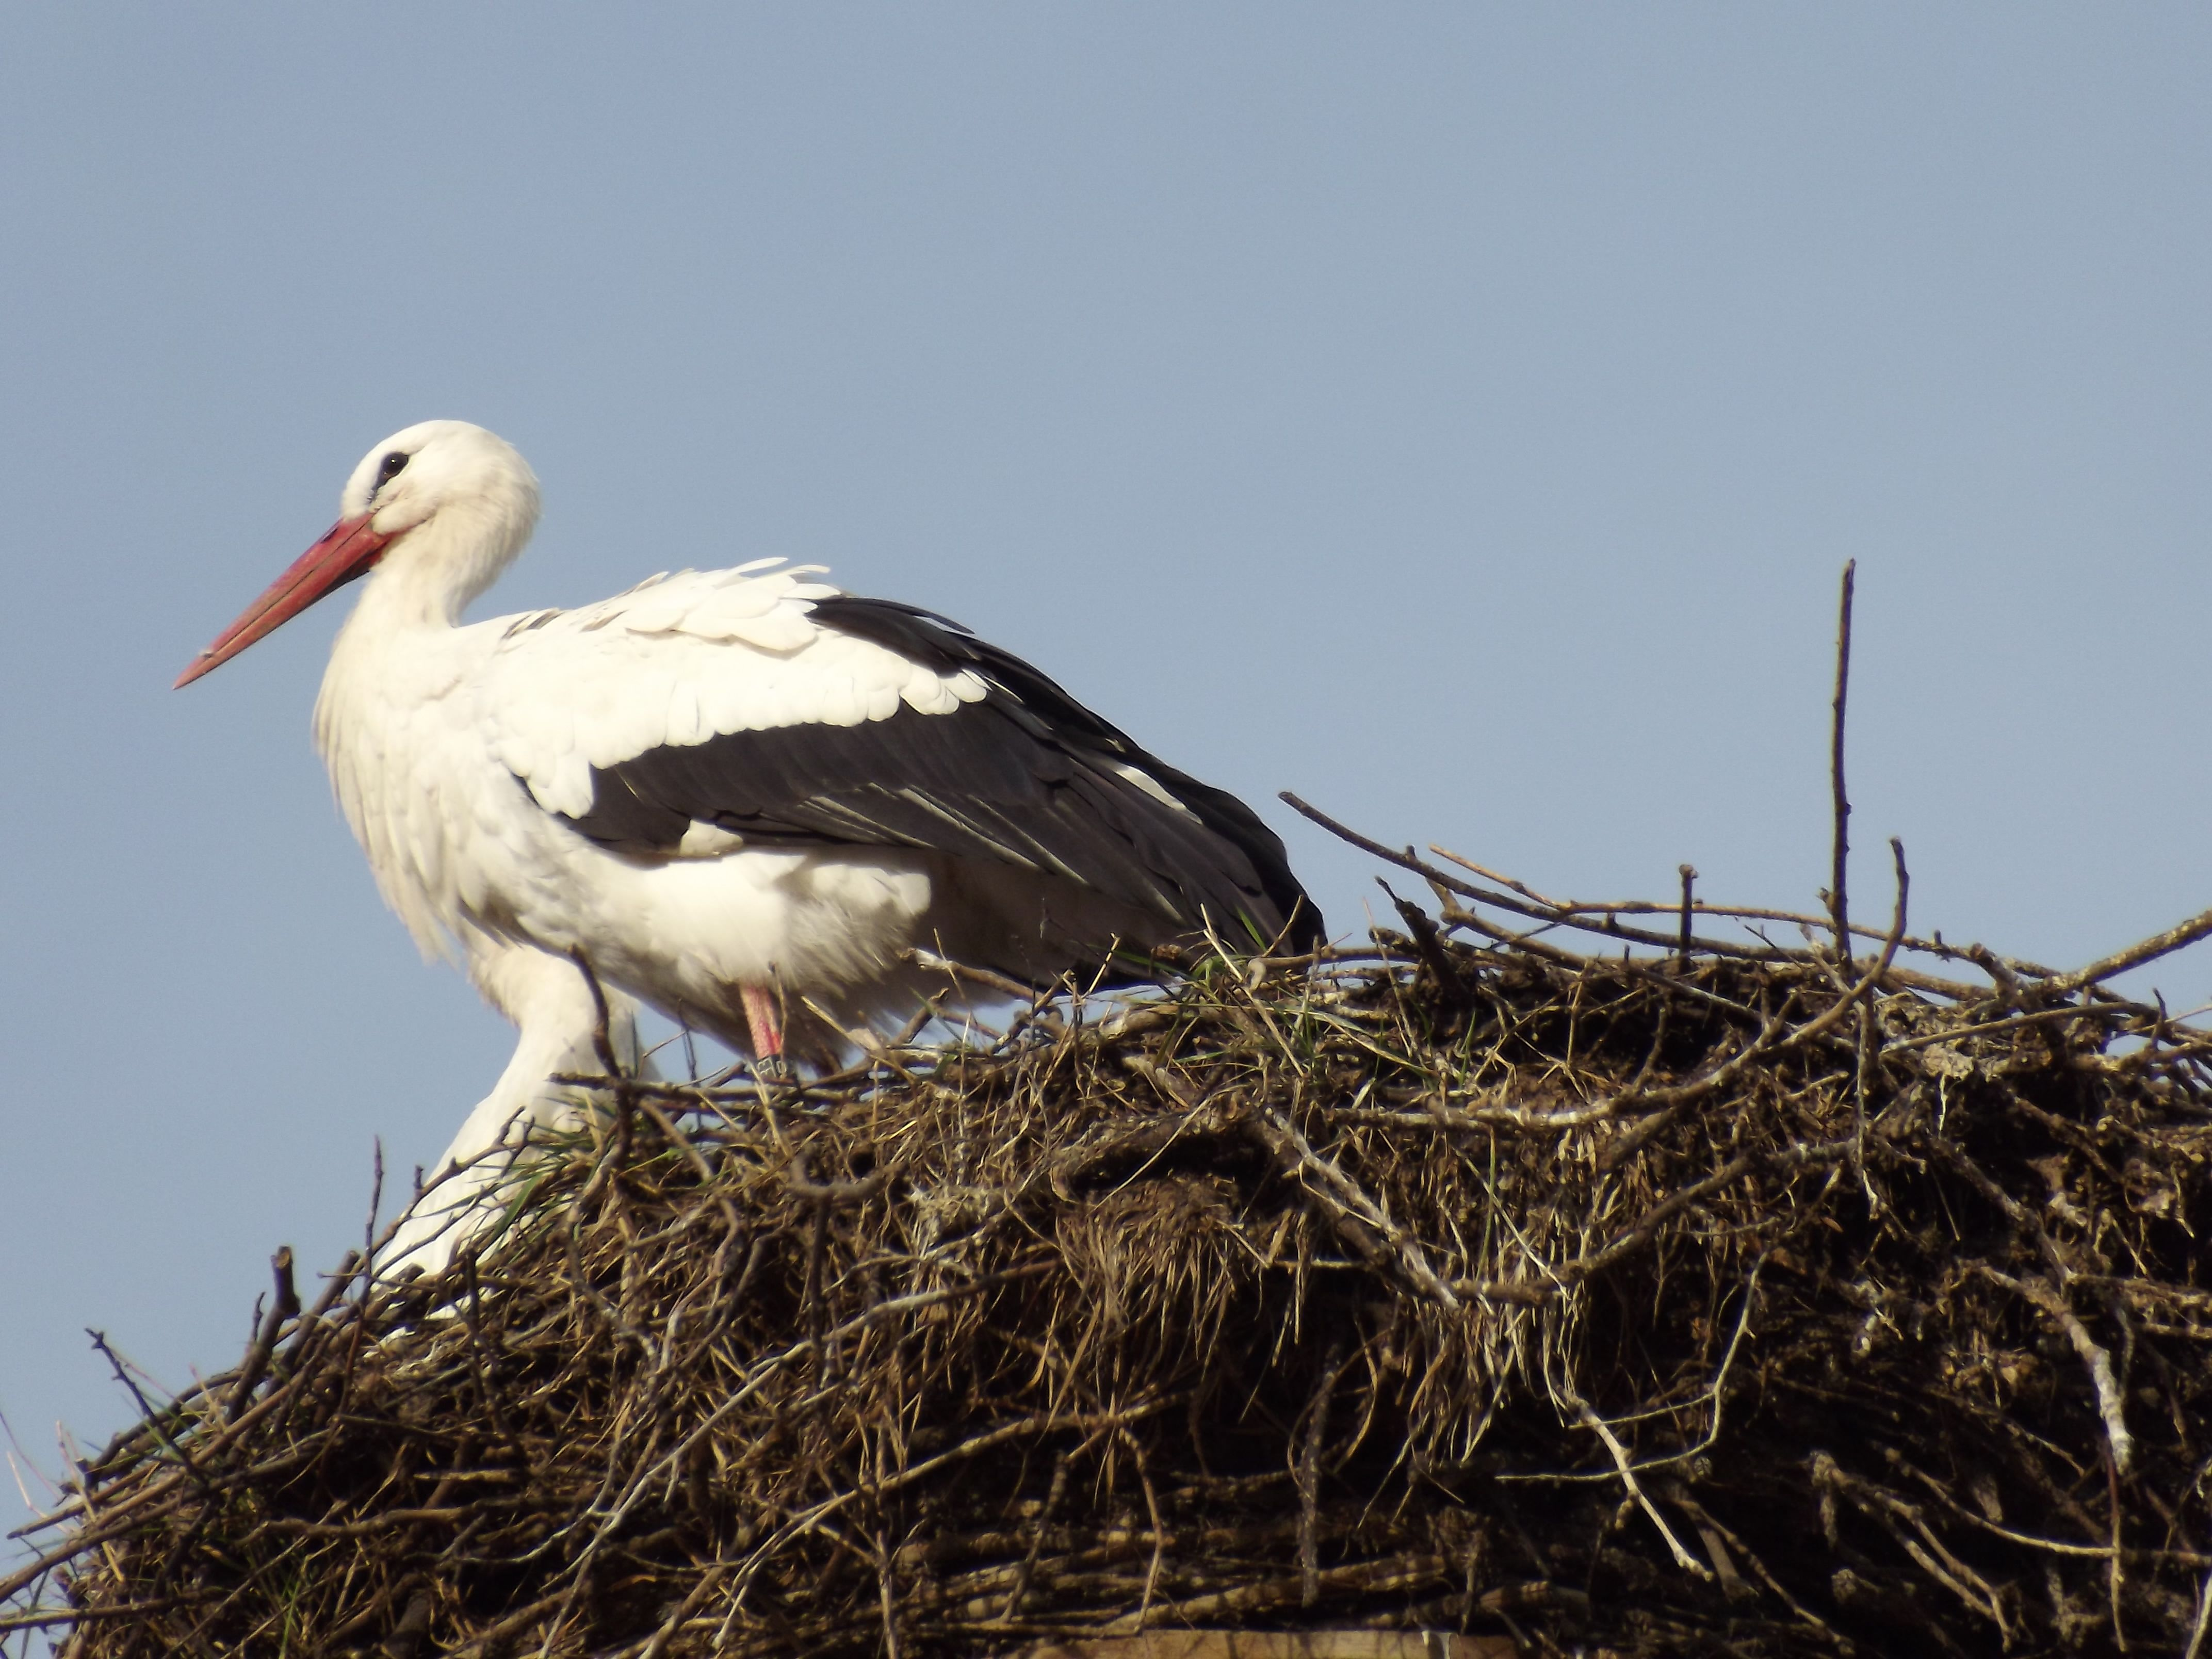 Cigogne à Gengenbach (Allemagne) - Stork in Gengenbach  Germany - Storch im Gengenbach